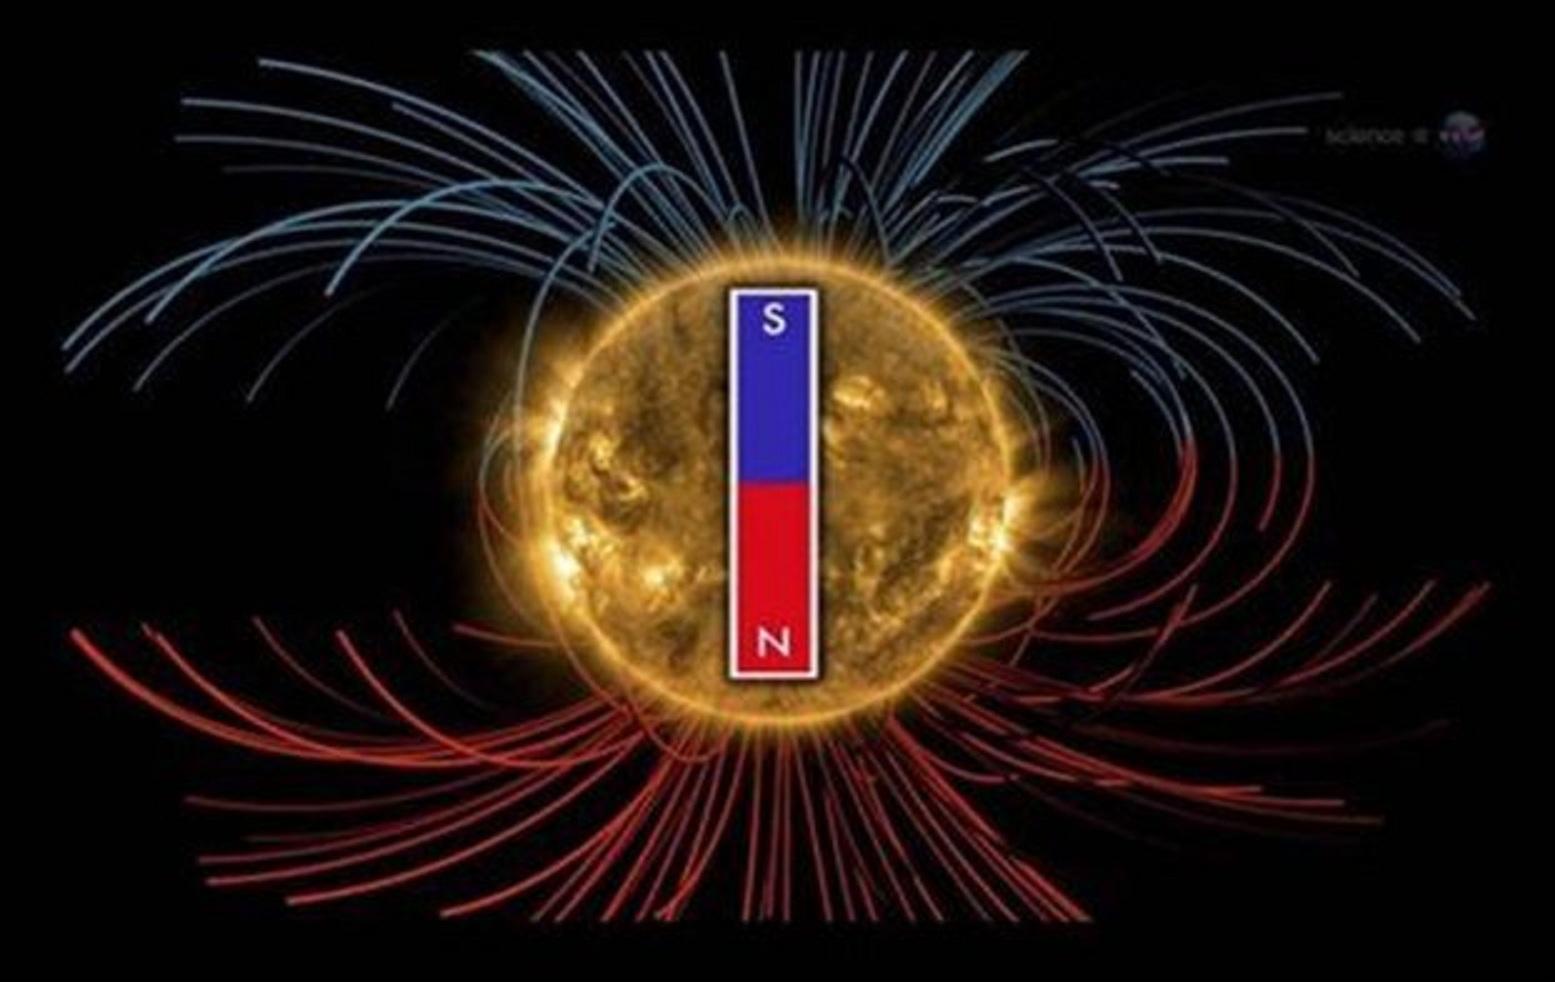 To πανίσχυρο μαγνητικό πεδίο του Ήλιου αλλάζει πολικότητα κάθε 11 χρόνια Πηγή:NASA